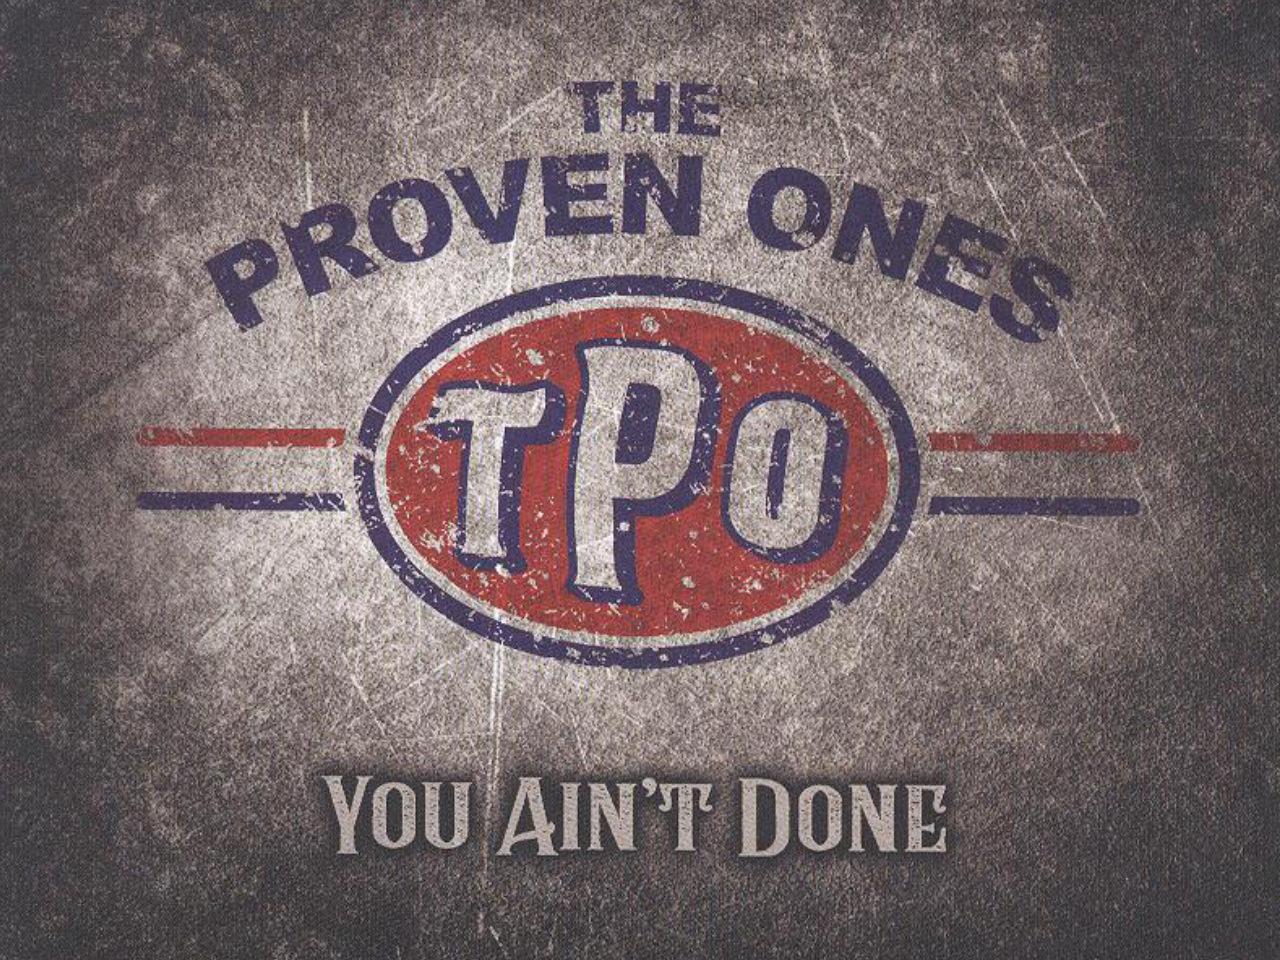 the proven ones - Okładka albumu